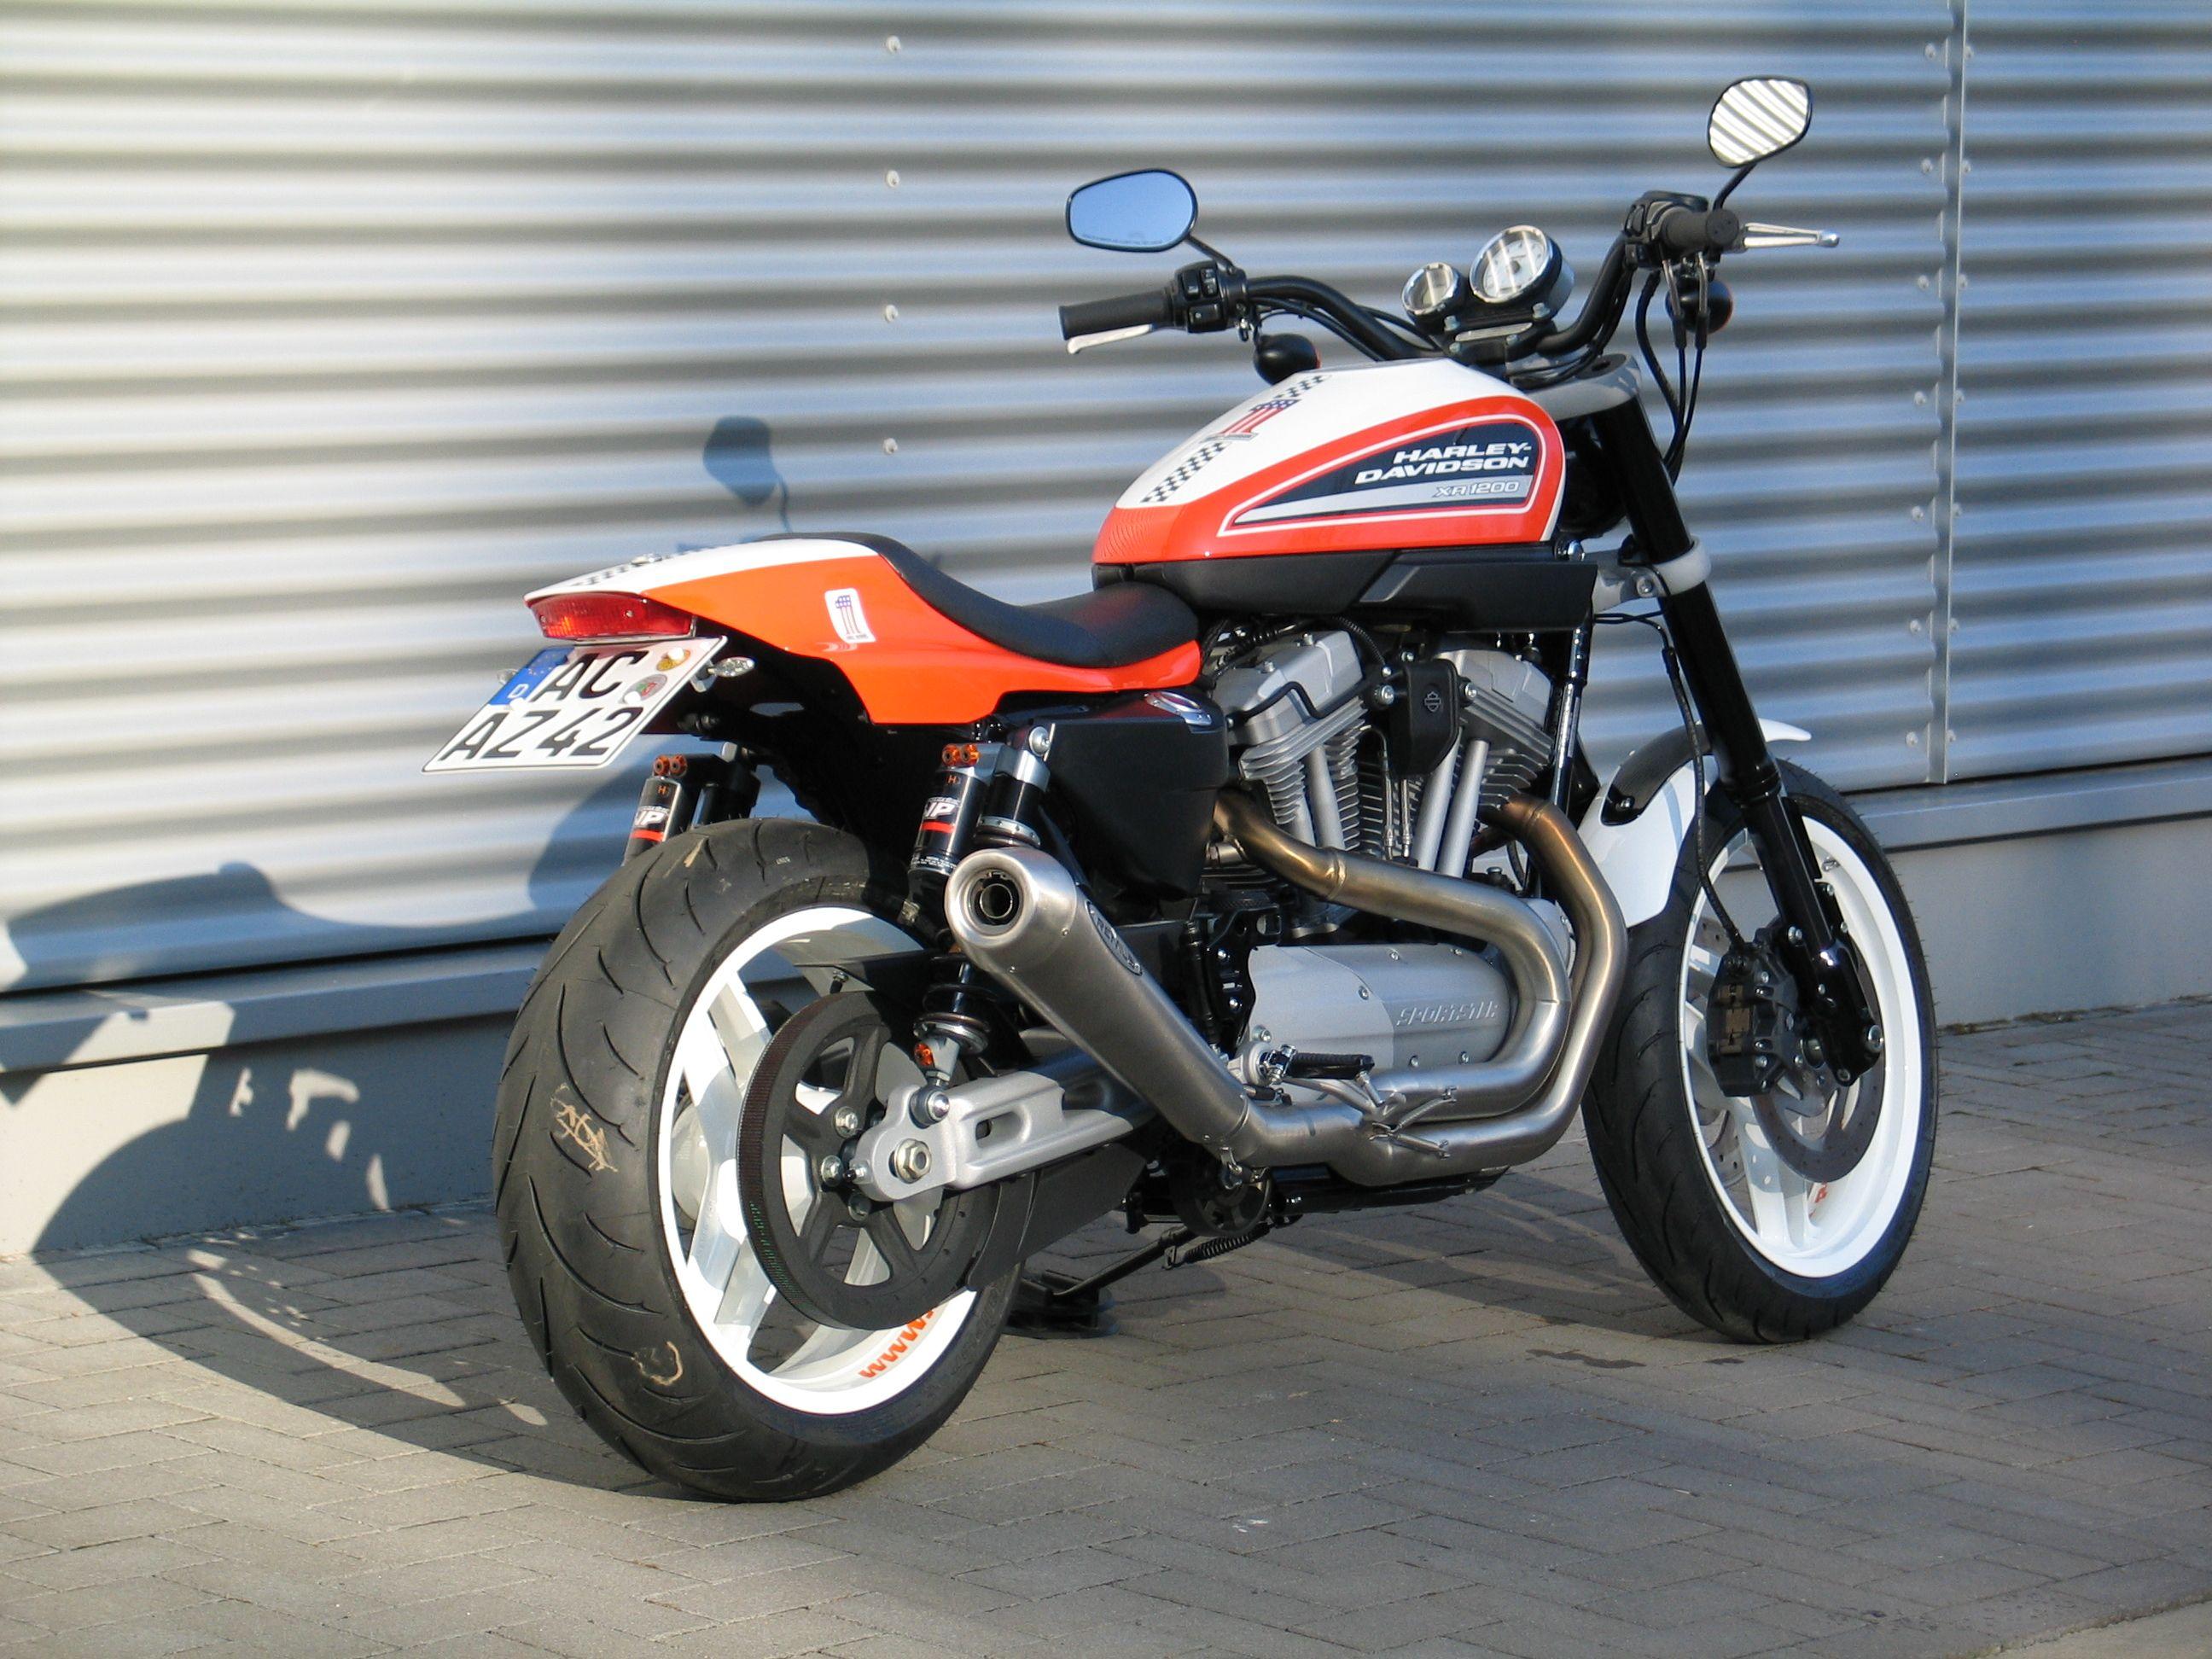 Harley-Davidson XR1200 #10 | bikes | Pinterest | Harley davidson ...